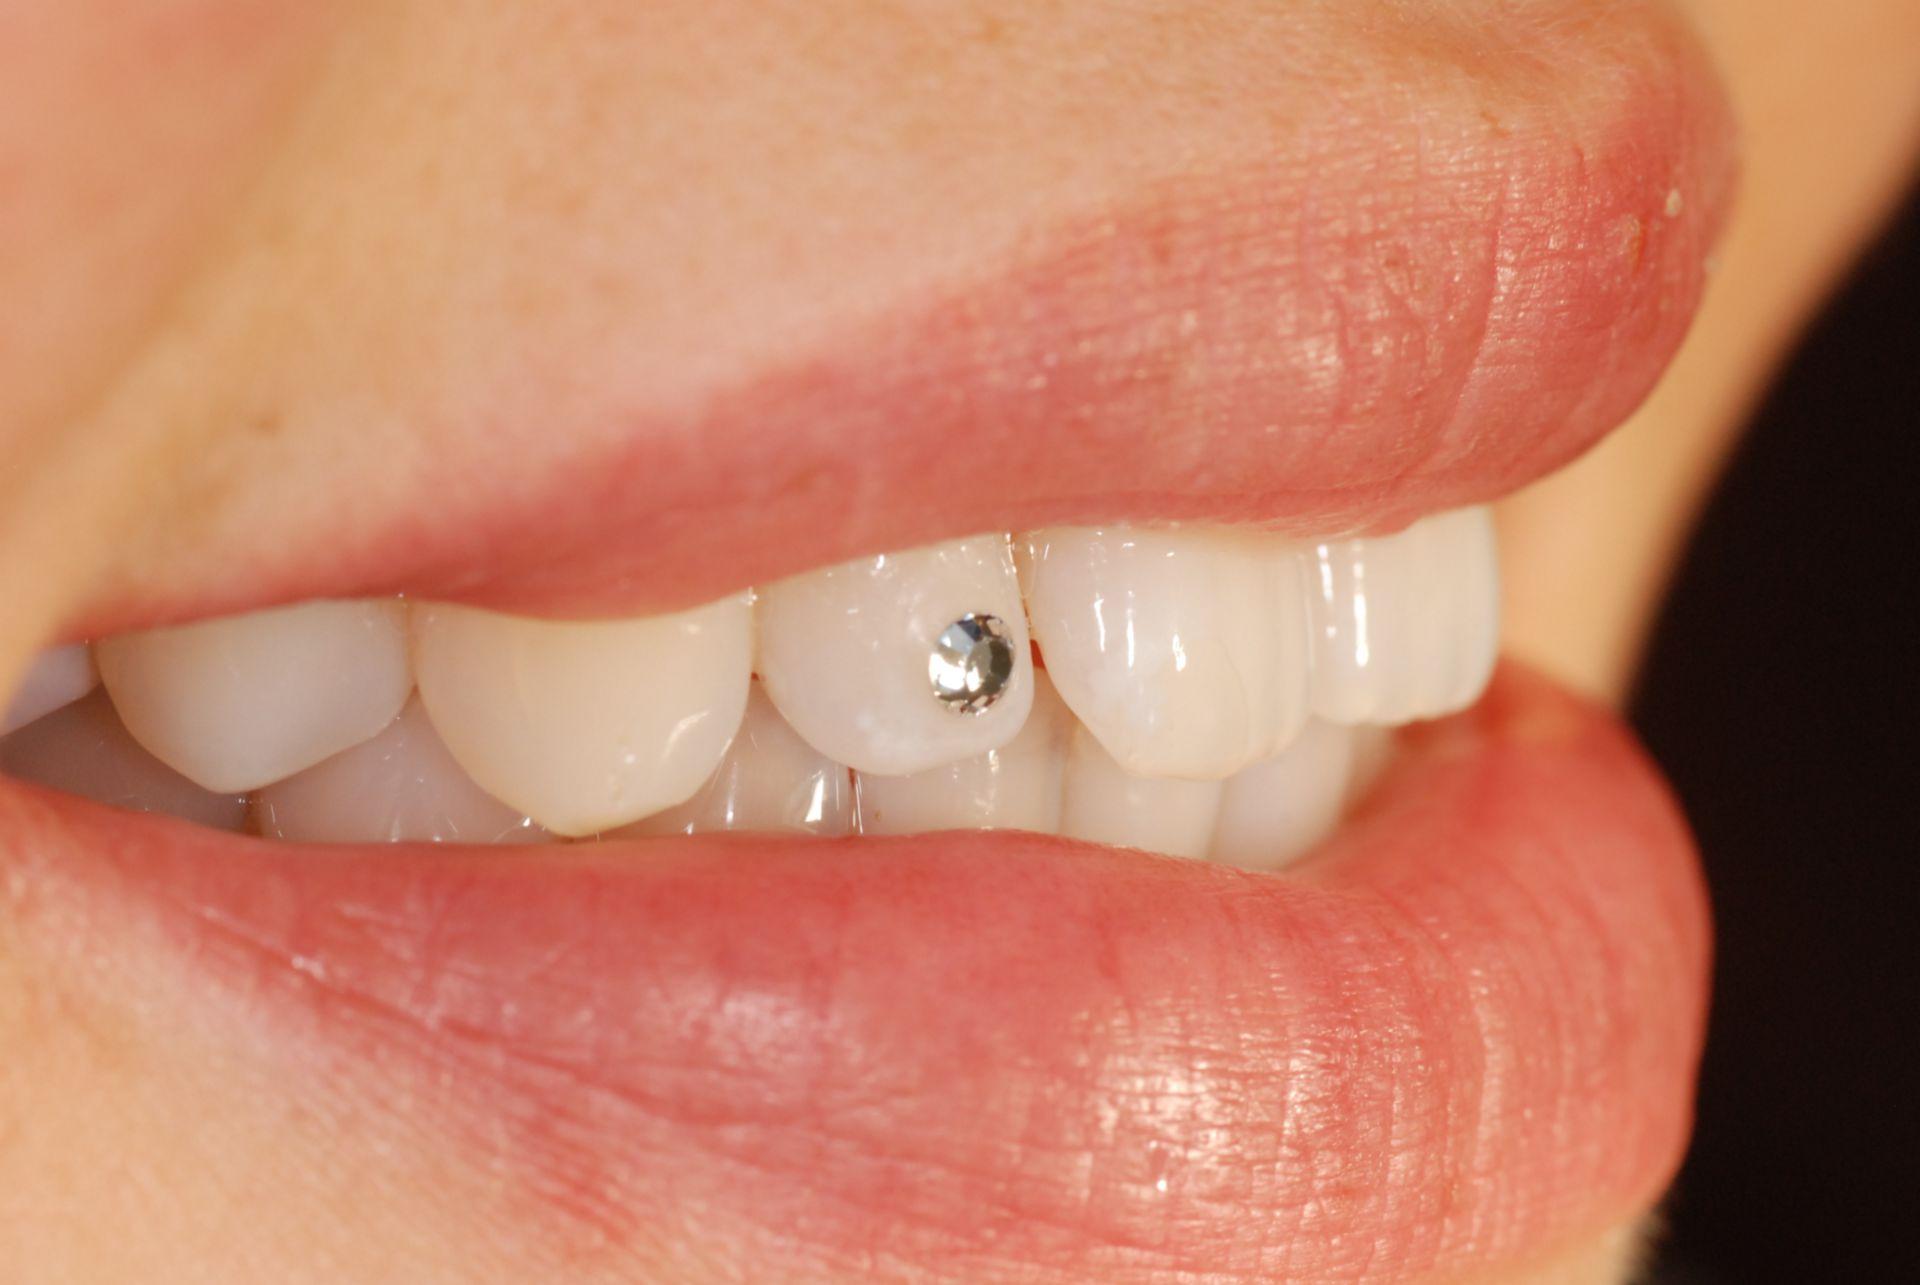 Rhinestone tooth